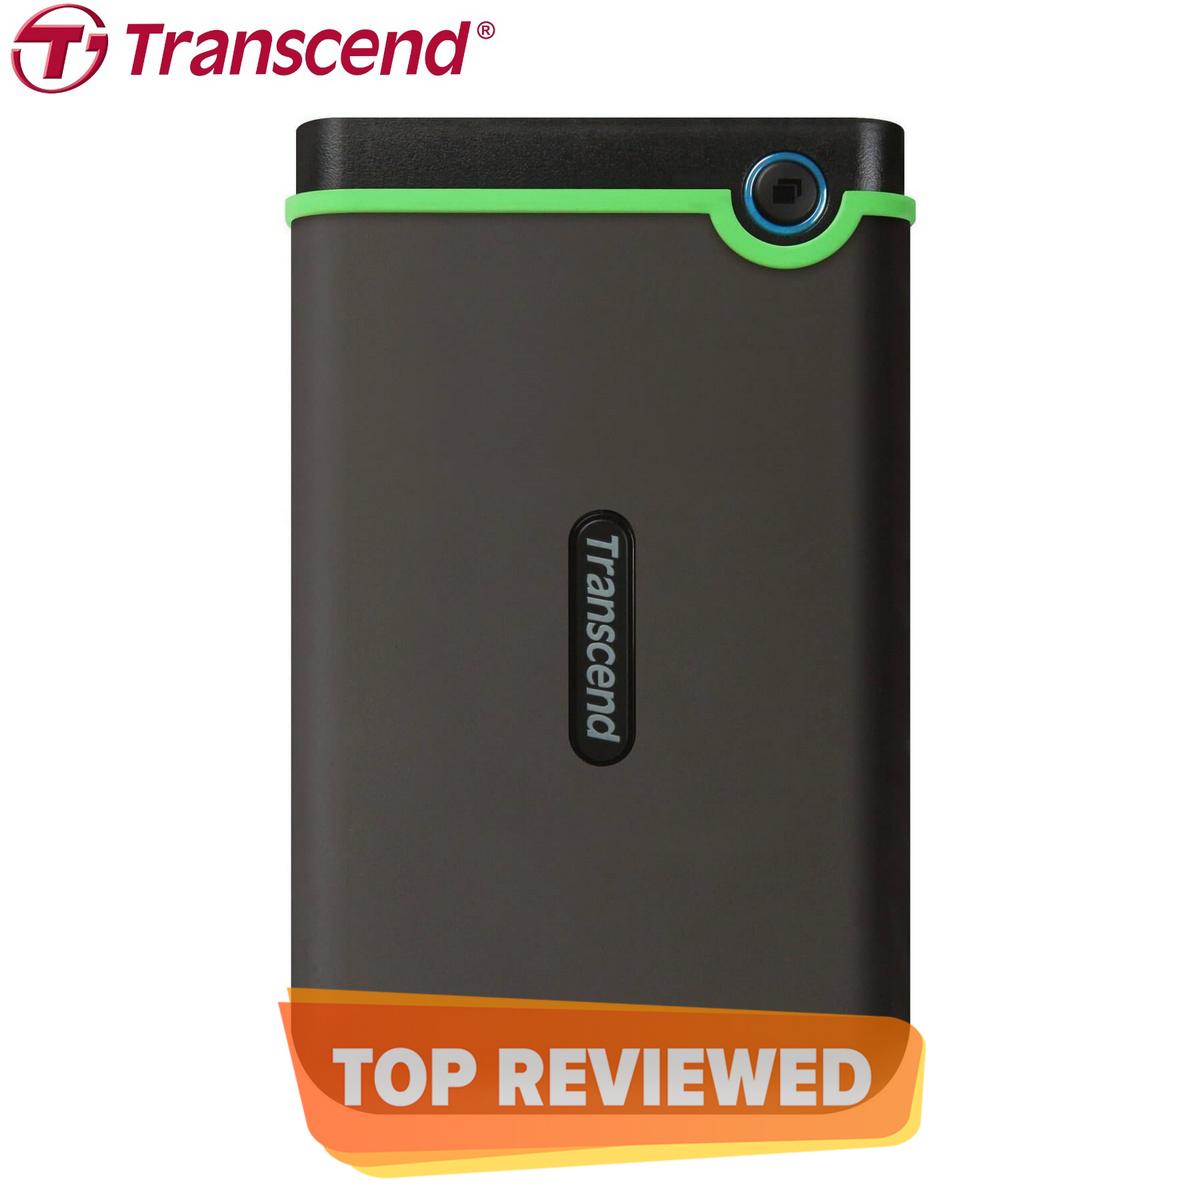 Transcend 1TB StoreJet 25M3S USB 3.1 External Hard Drive Shock Proof Military Drop Tested